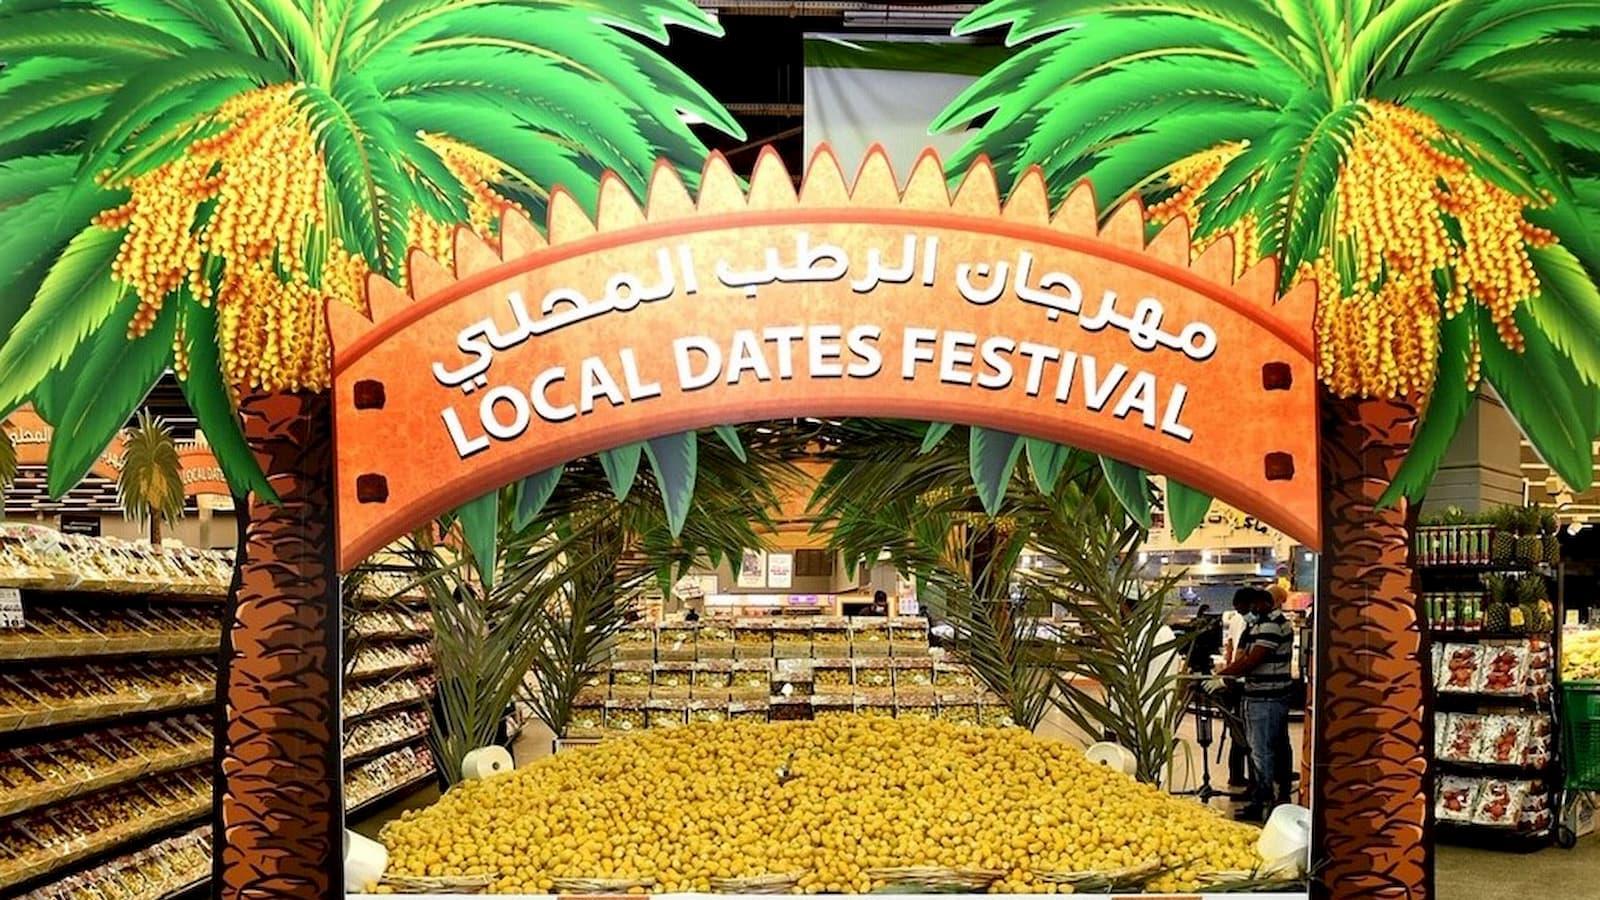 Local Dates Festival 2020 gets underway at Al Meera